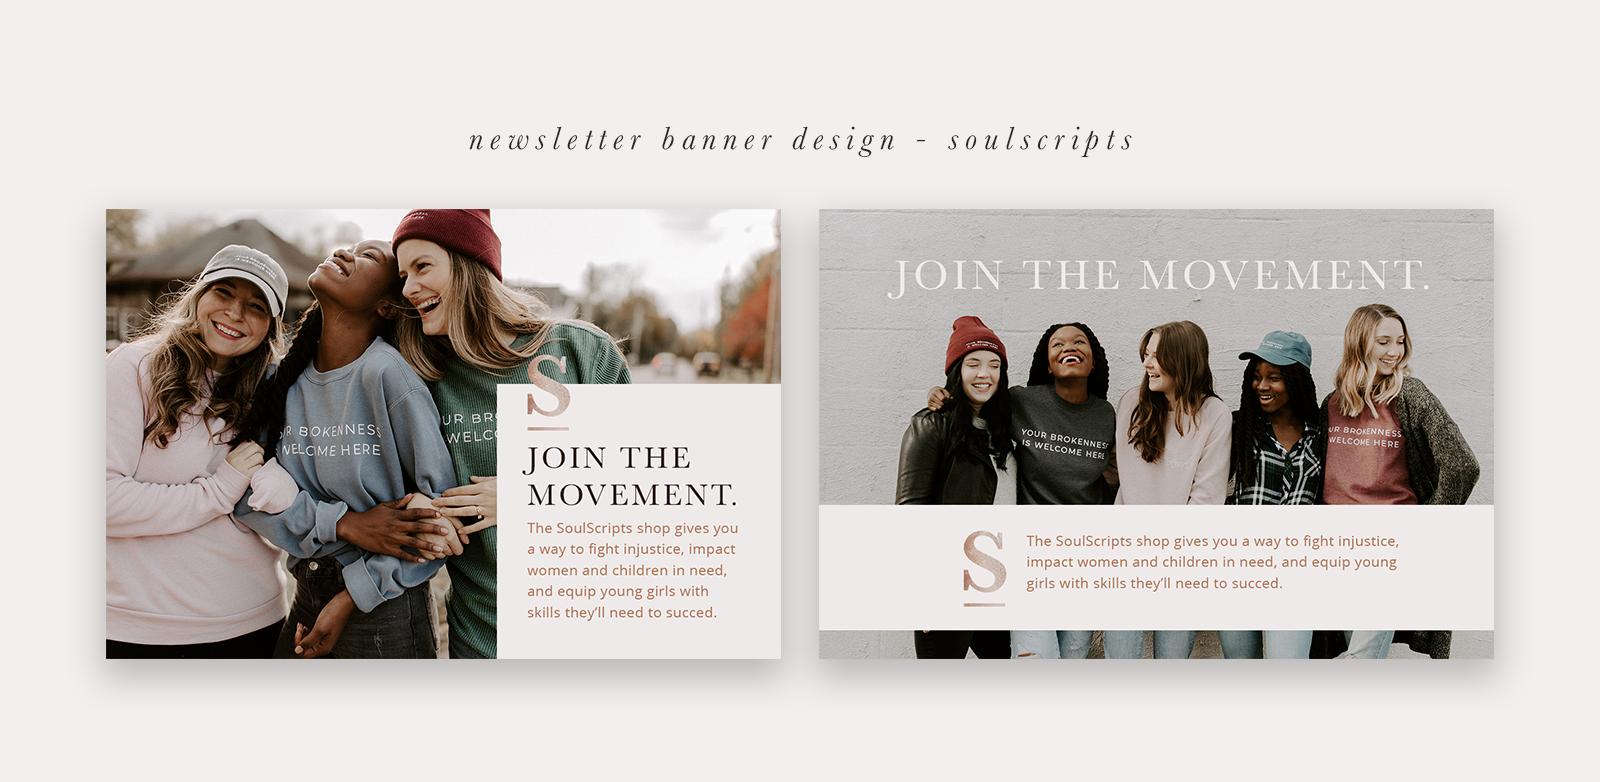 SoulScripts by Jordan Lee Dooley | Branding and Graphic Design for Female Entrepreneurs | Brand Identity Design | Branding Color Palette | Brand Design Inspiration | Brand Board | Color Palette Inspiration | Minimalist Brand Design | Branding Board | Logo Design Inspiration | Visual Identity | Brand Guidelines | Molly Ho Studio